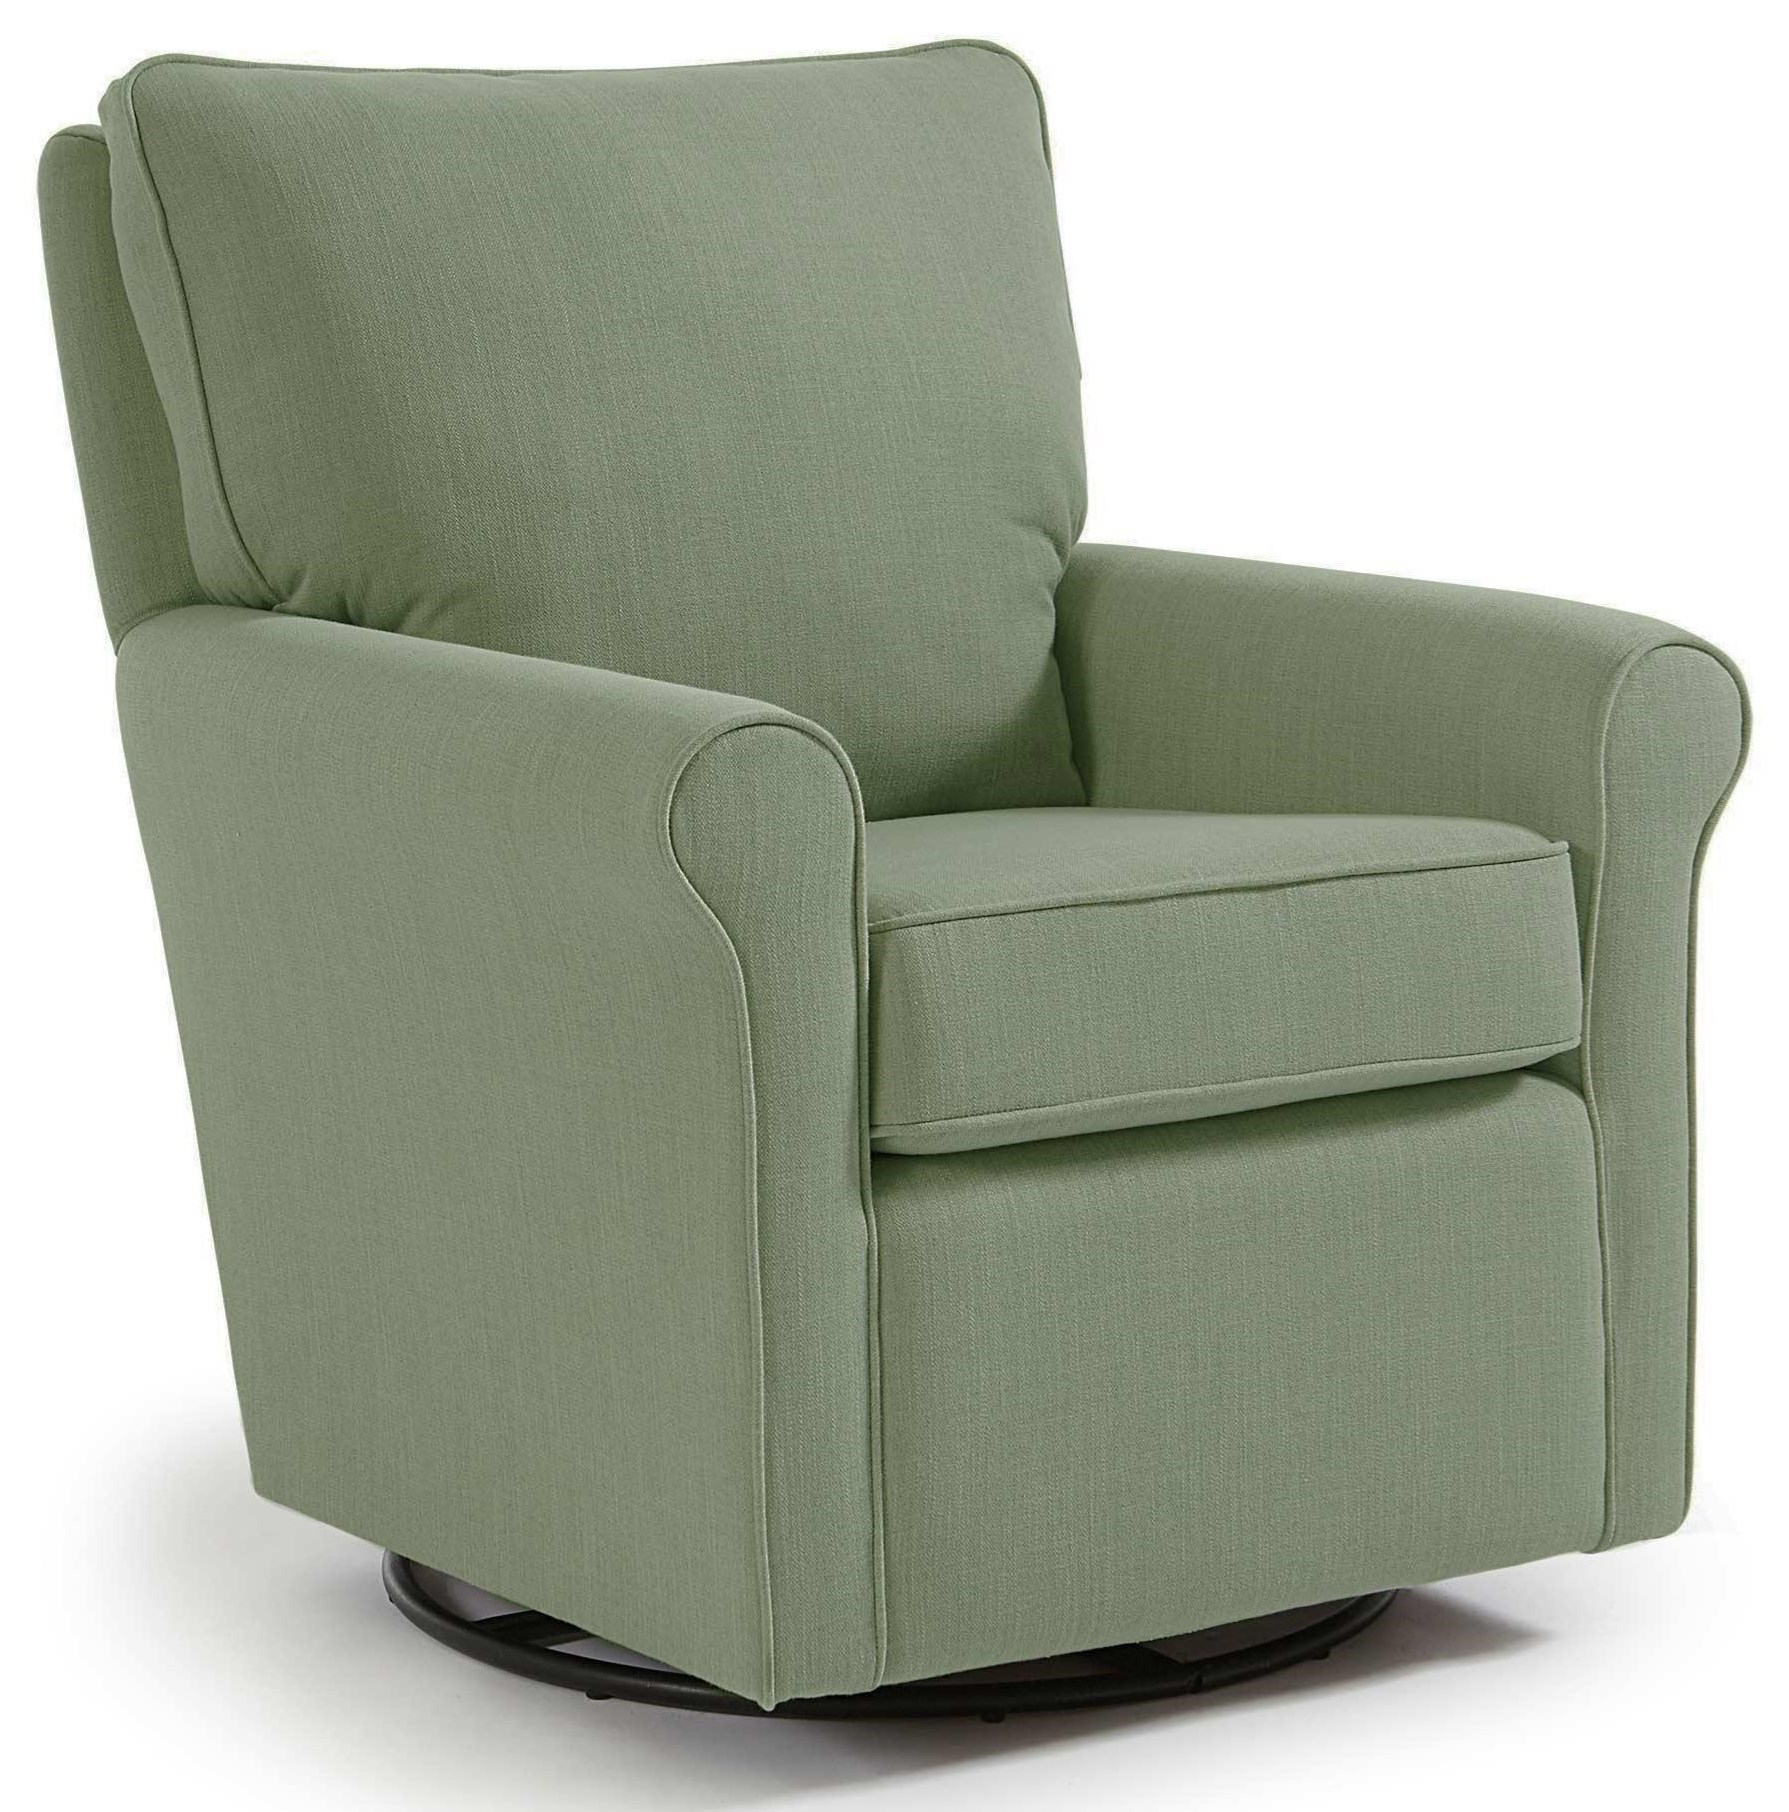 Kacey Swivel Glider Chair